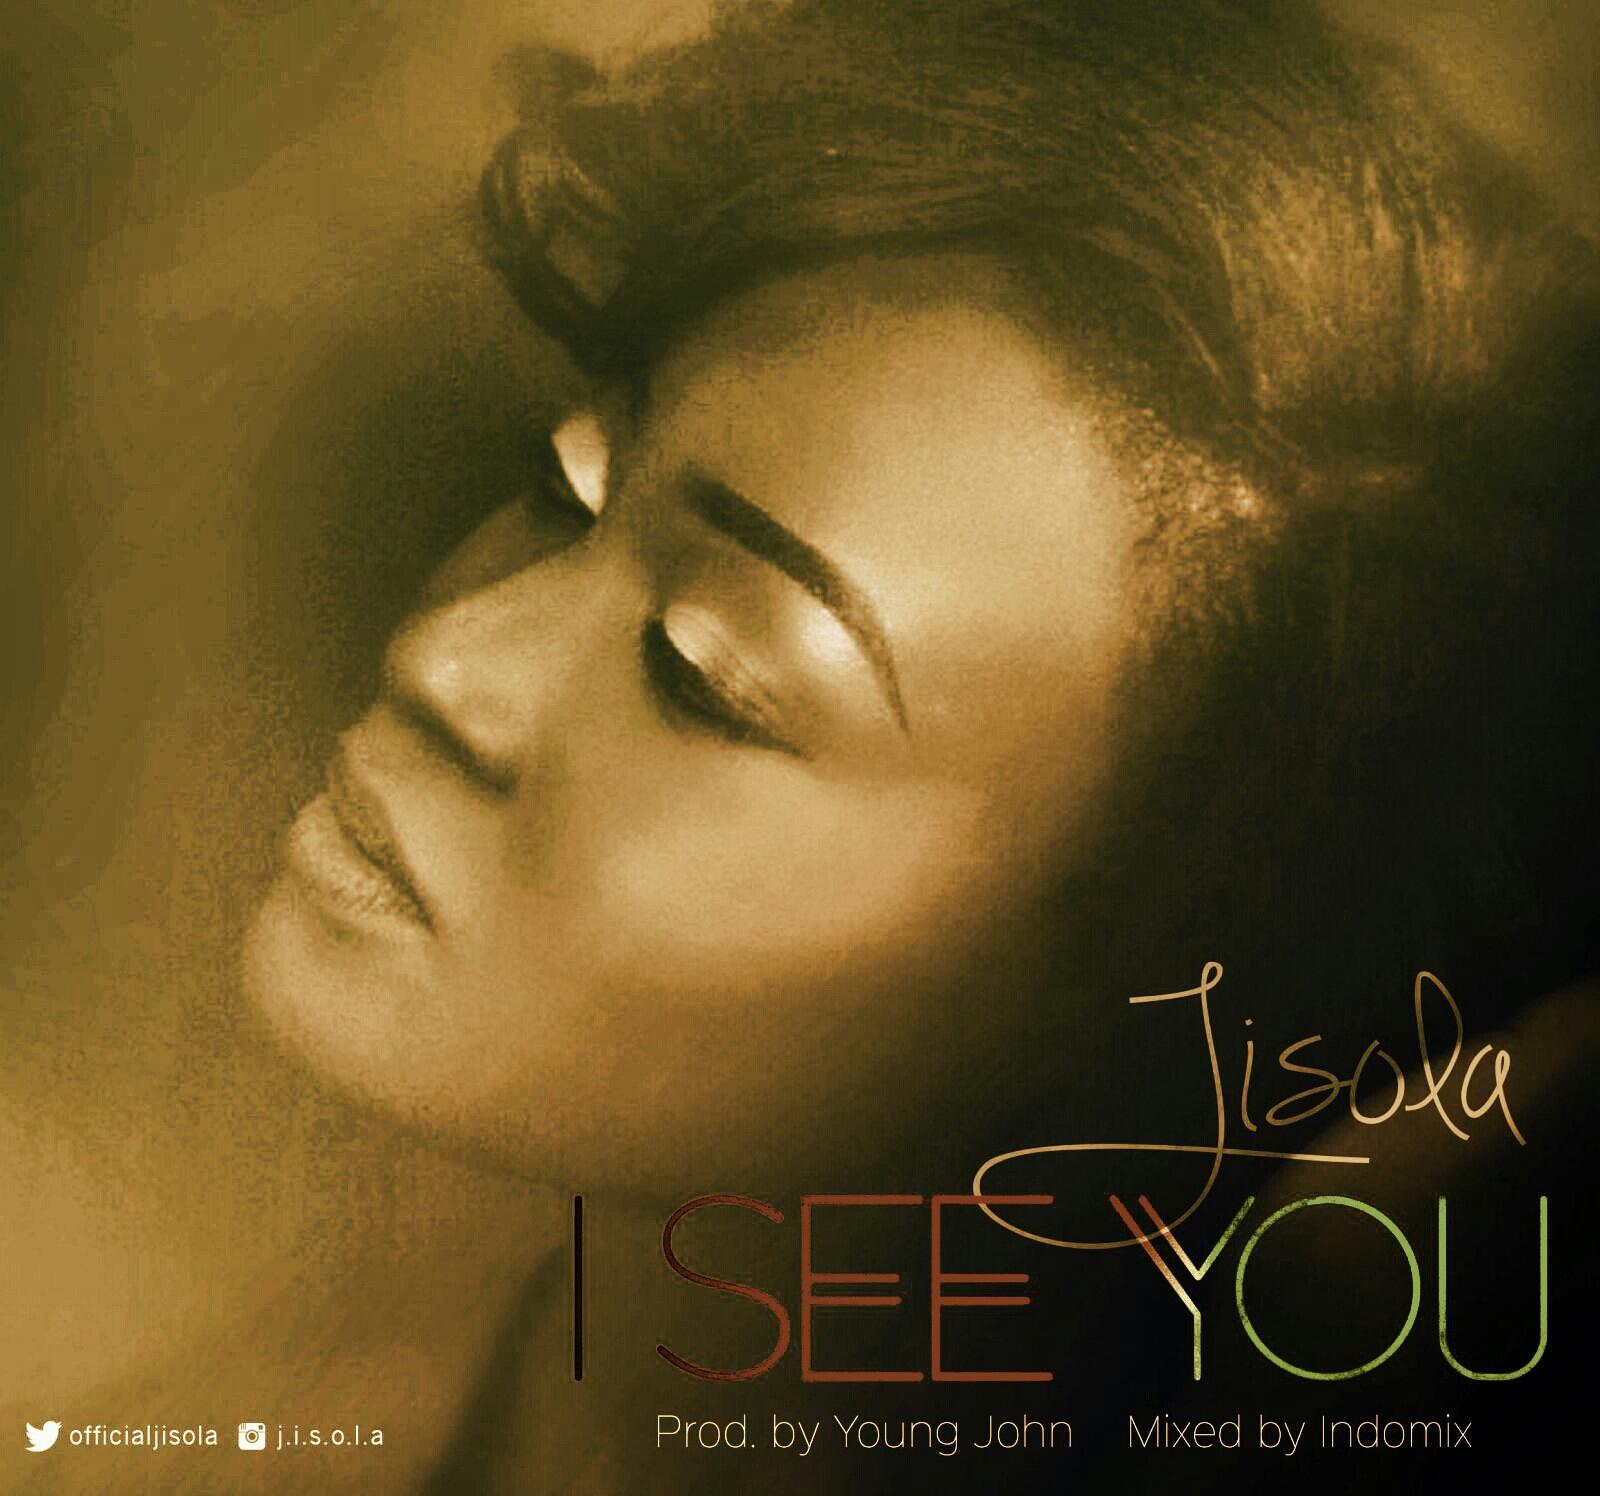 Jisola - I See You